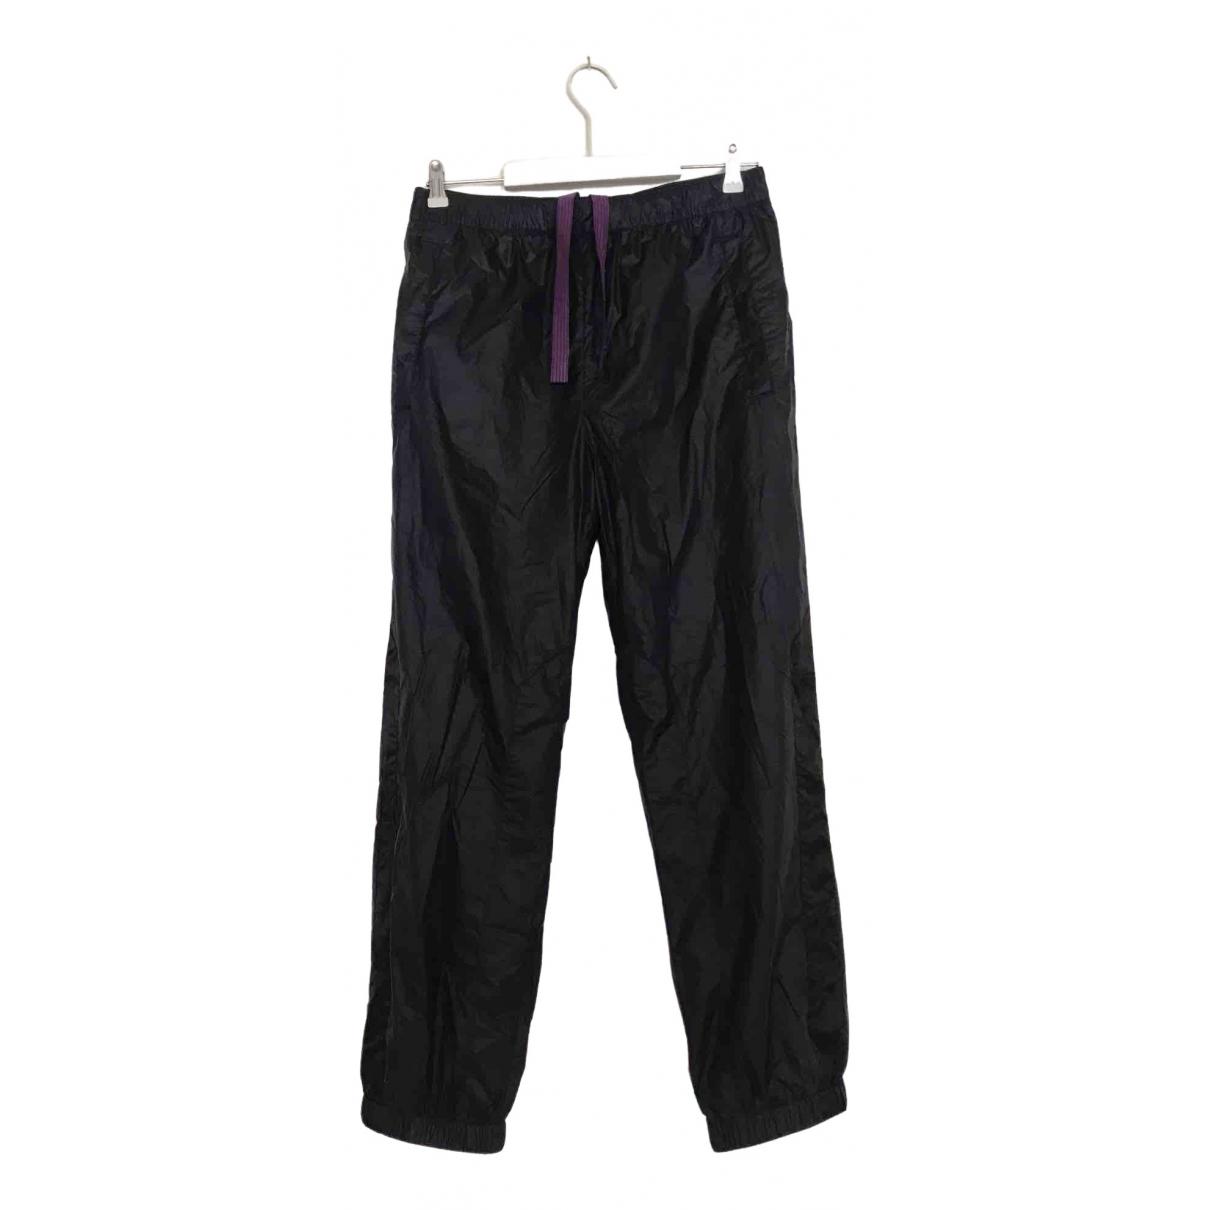 Acne Studios \N Navy Trousers for Men 46 IT